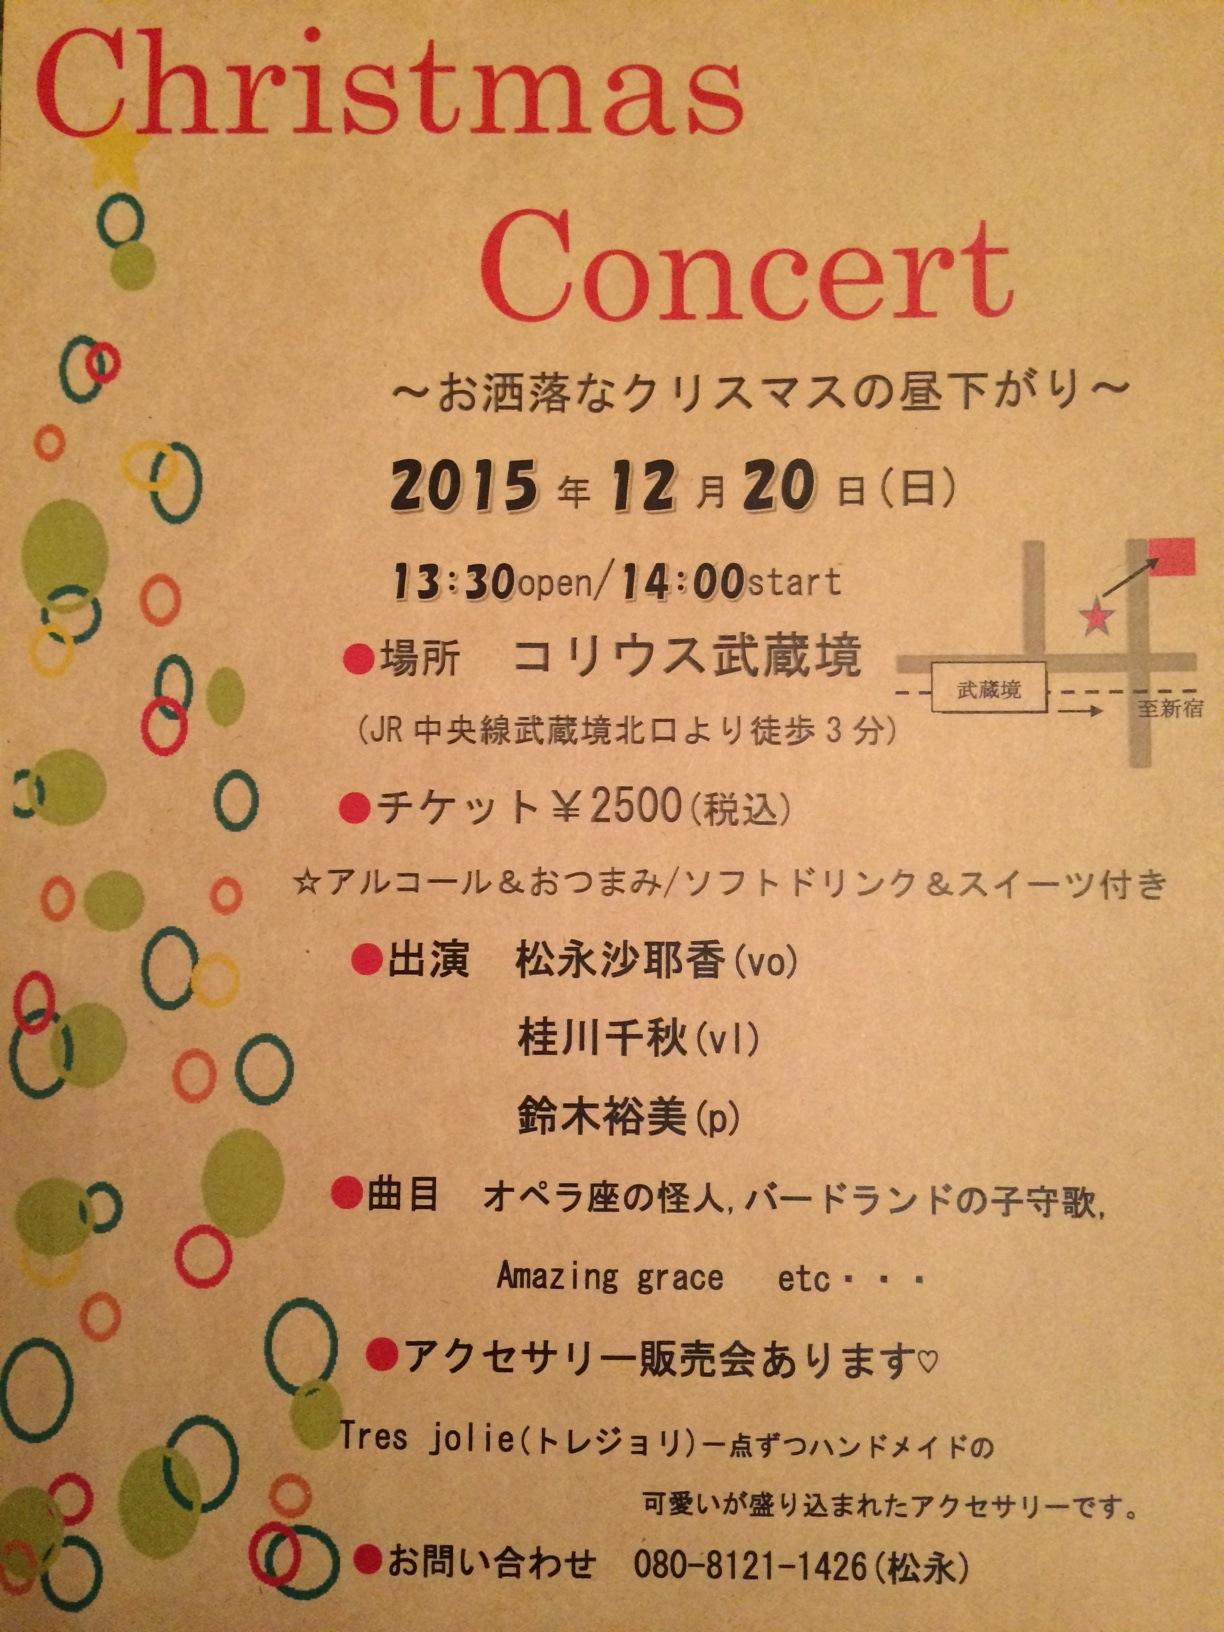 ChristmasConcert〜お洒落なクリスマスの昼下がり〜 2015:12:20